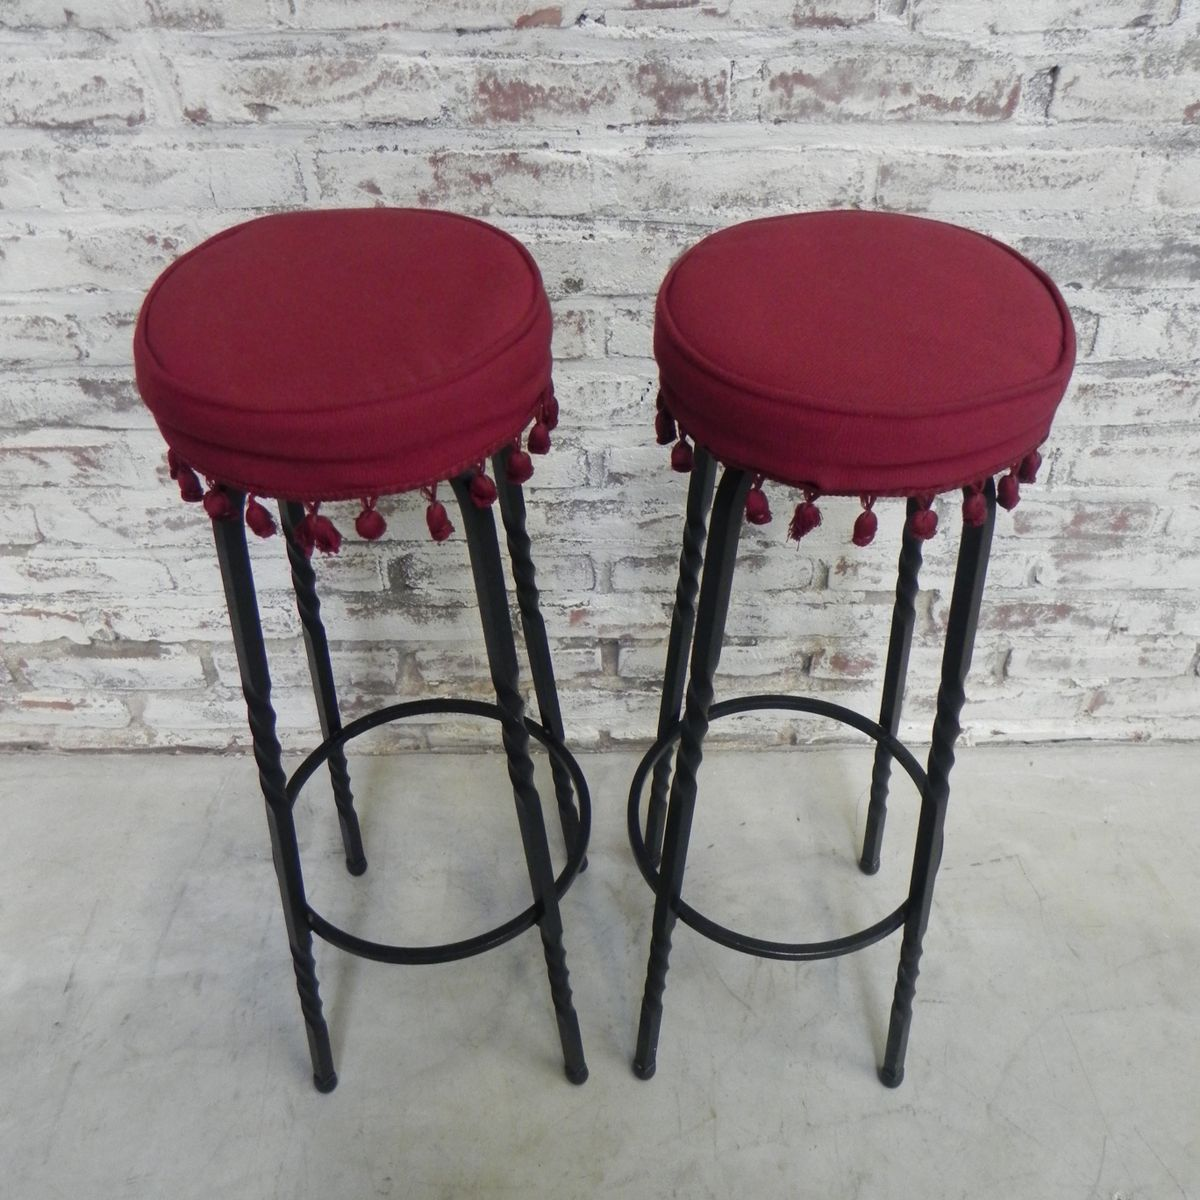 tabourets de bar vintage set de 2 en vente sur pamono. Black Bedroom Furniture Sets. Home Design Ideas